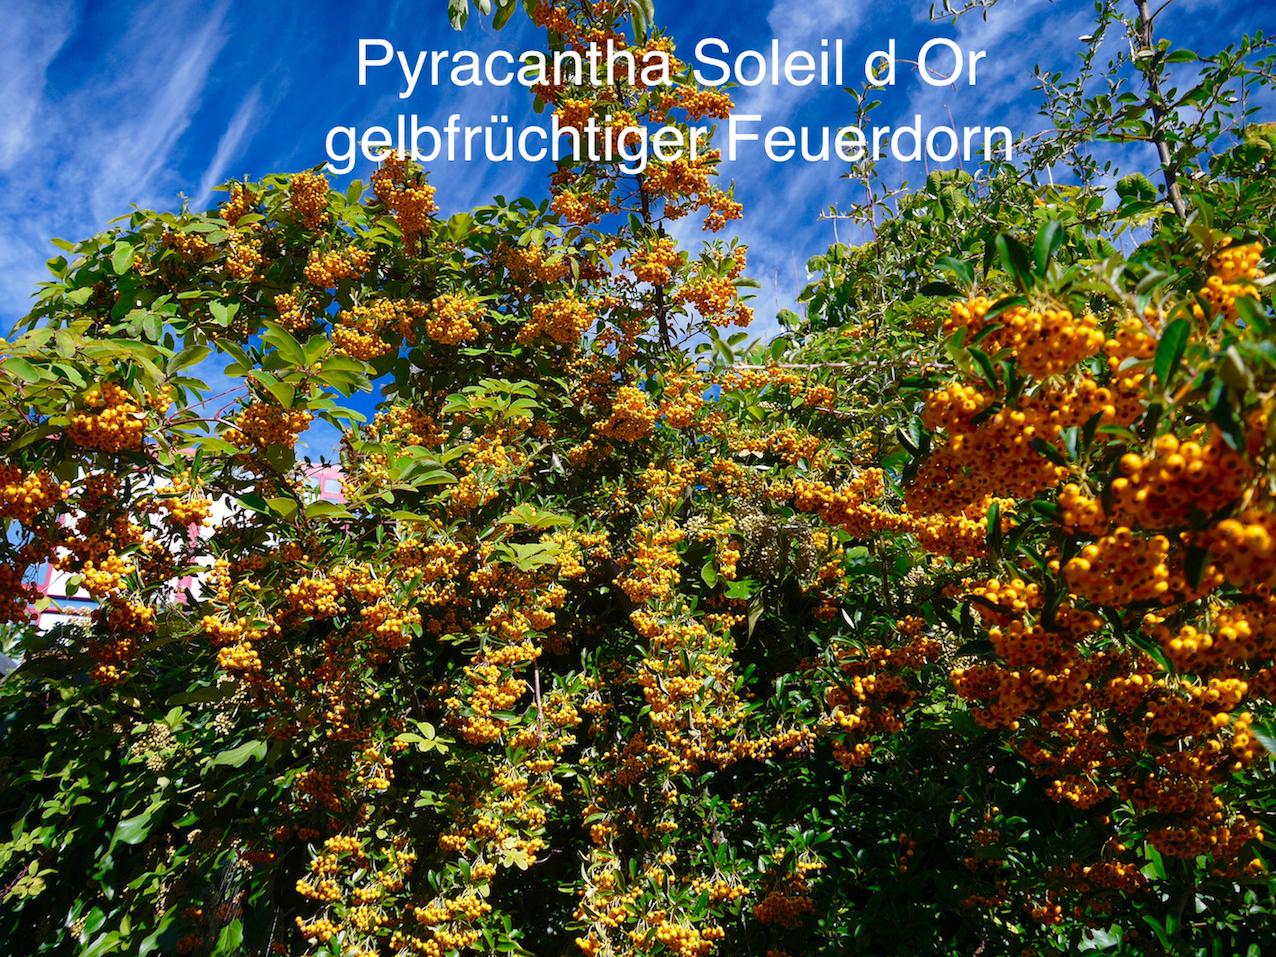 pyracantha-soleil-d-or